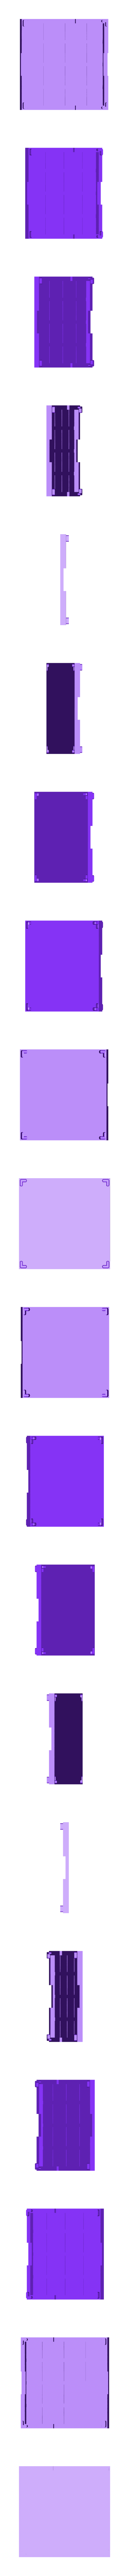 Modular_Floor.stl Download free STL file Modular Mech Buildings • 3D printable object, mrhers2